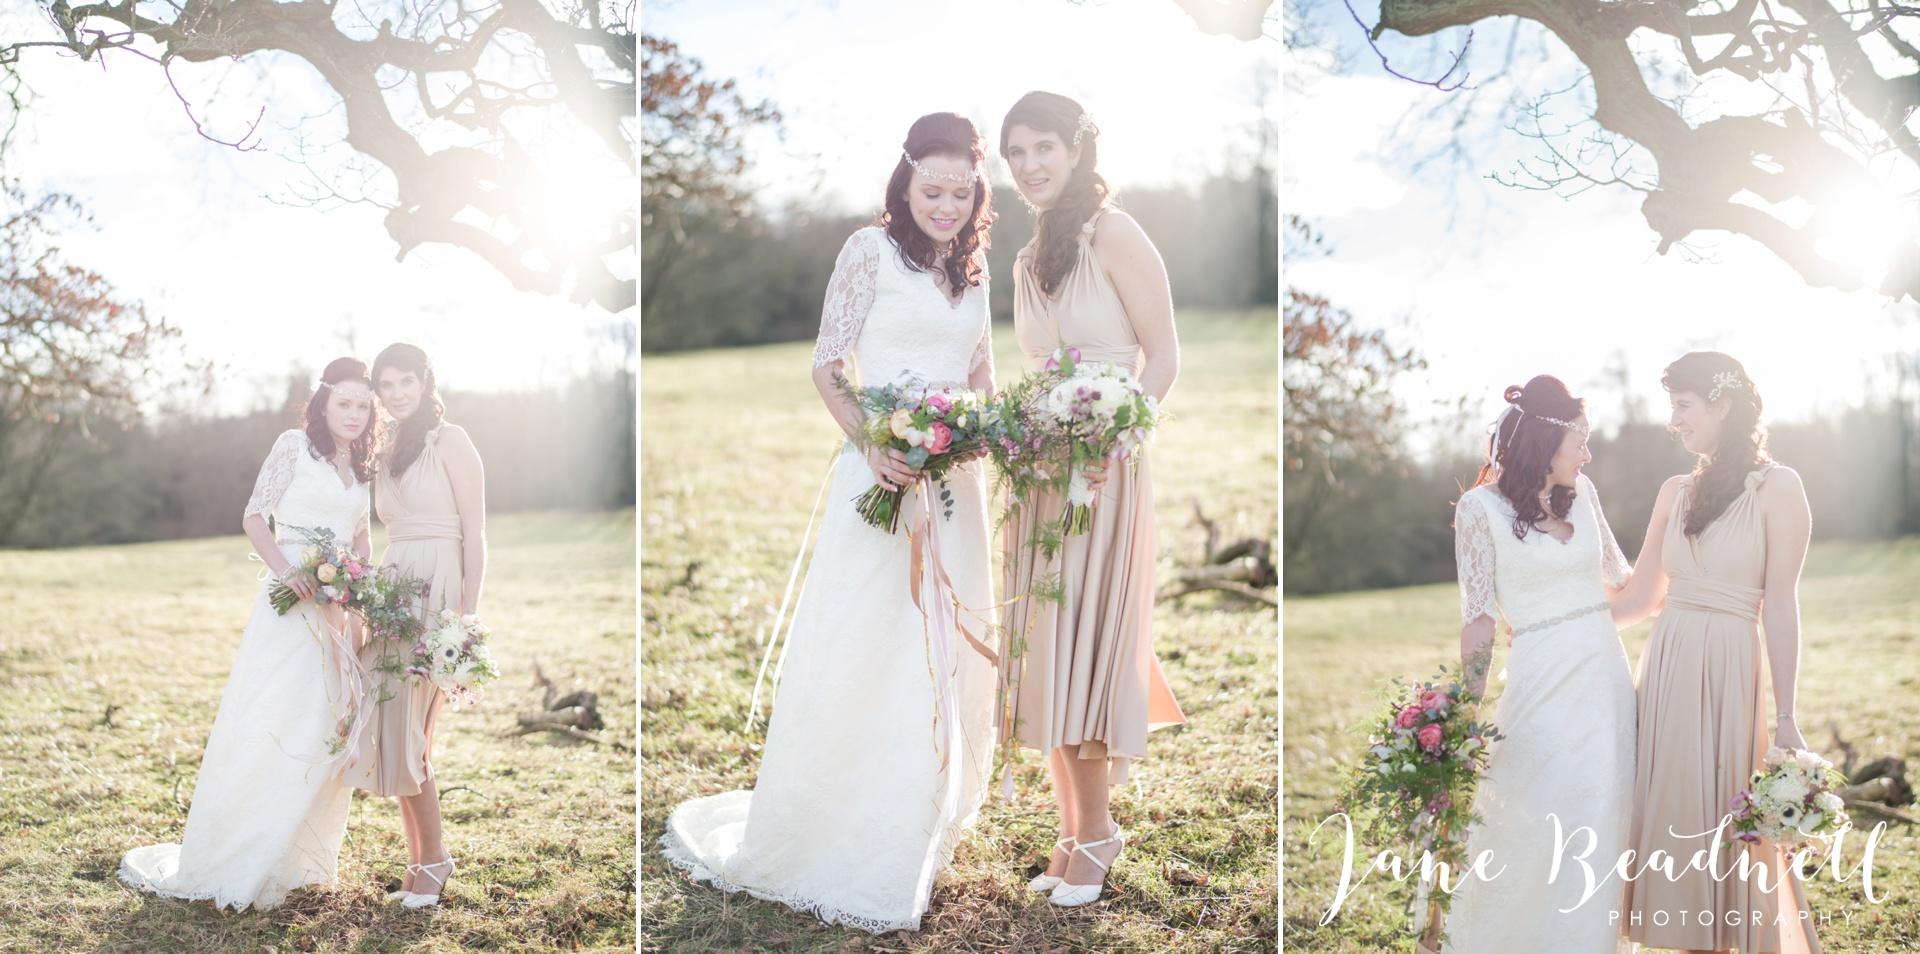 Jane Beadnell fine art wedding photographer Swinton Park13